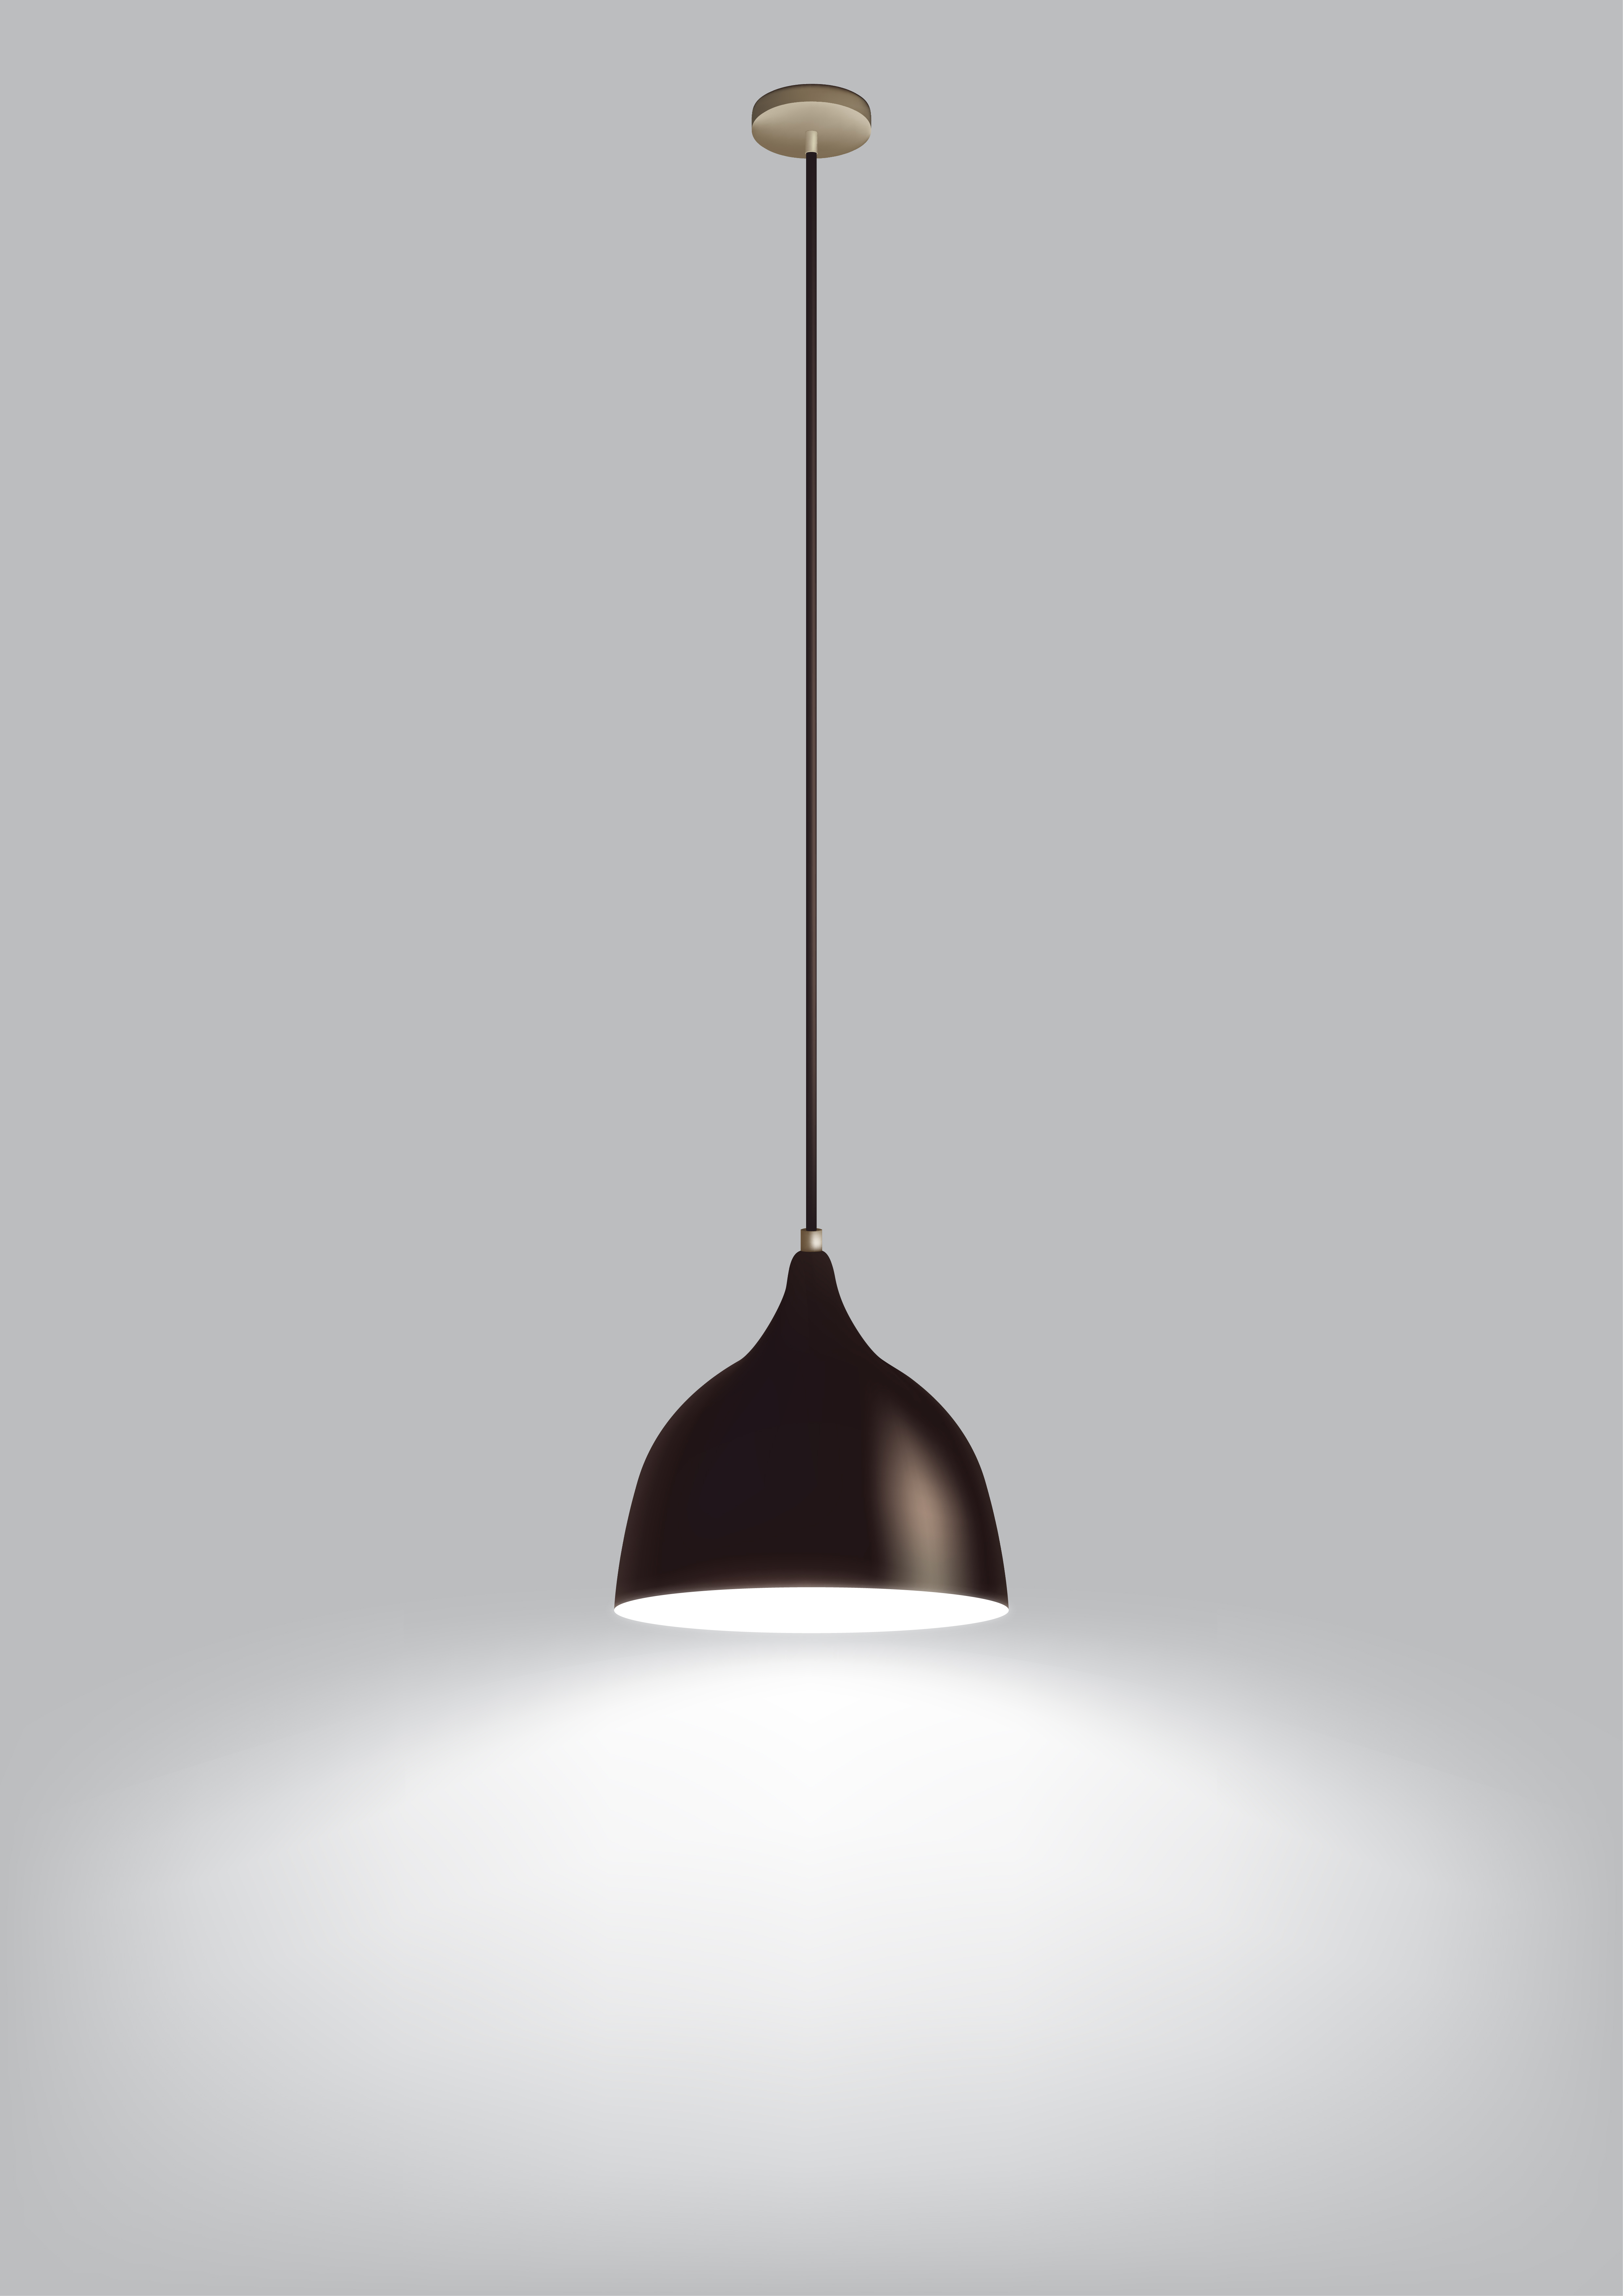 Black Ceiling Lamp Download Free Vectors Clipart